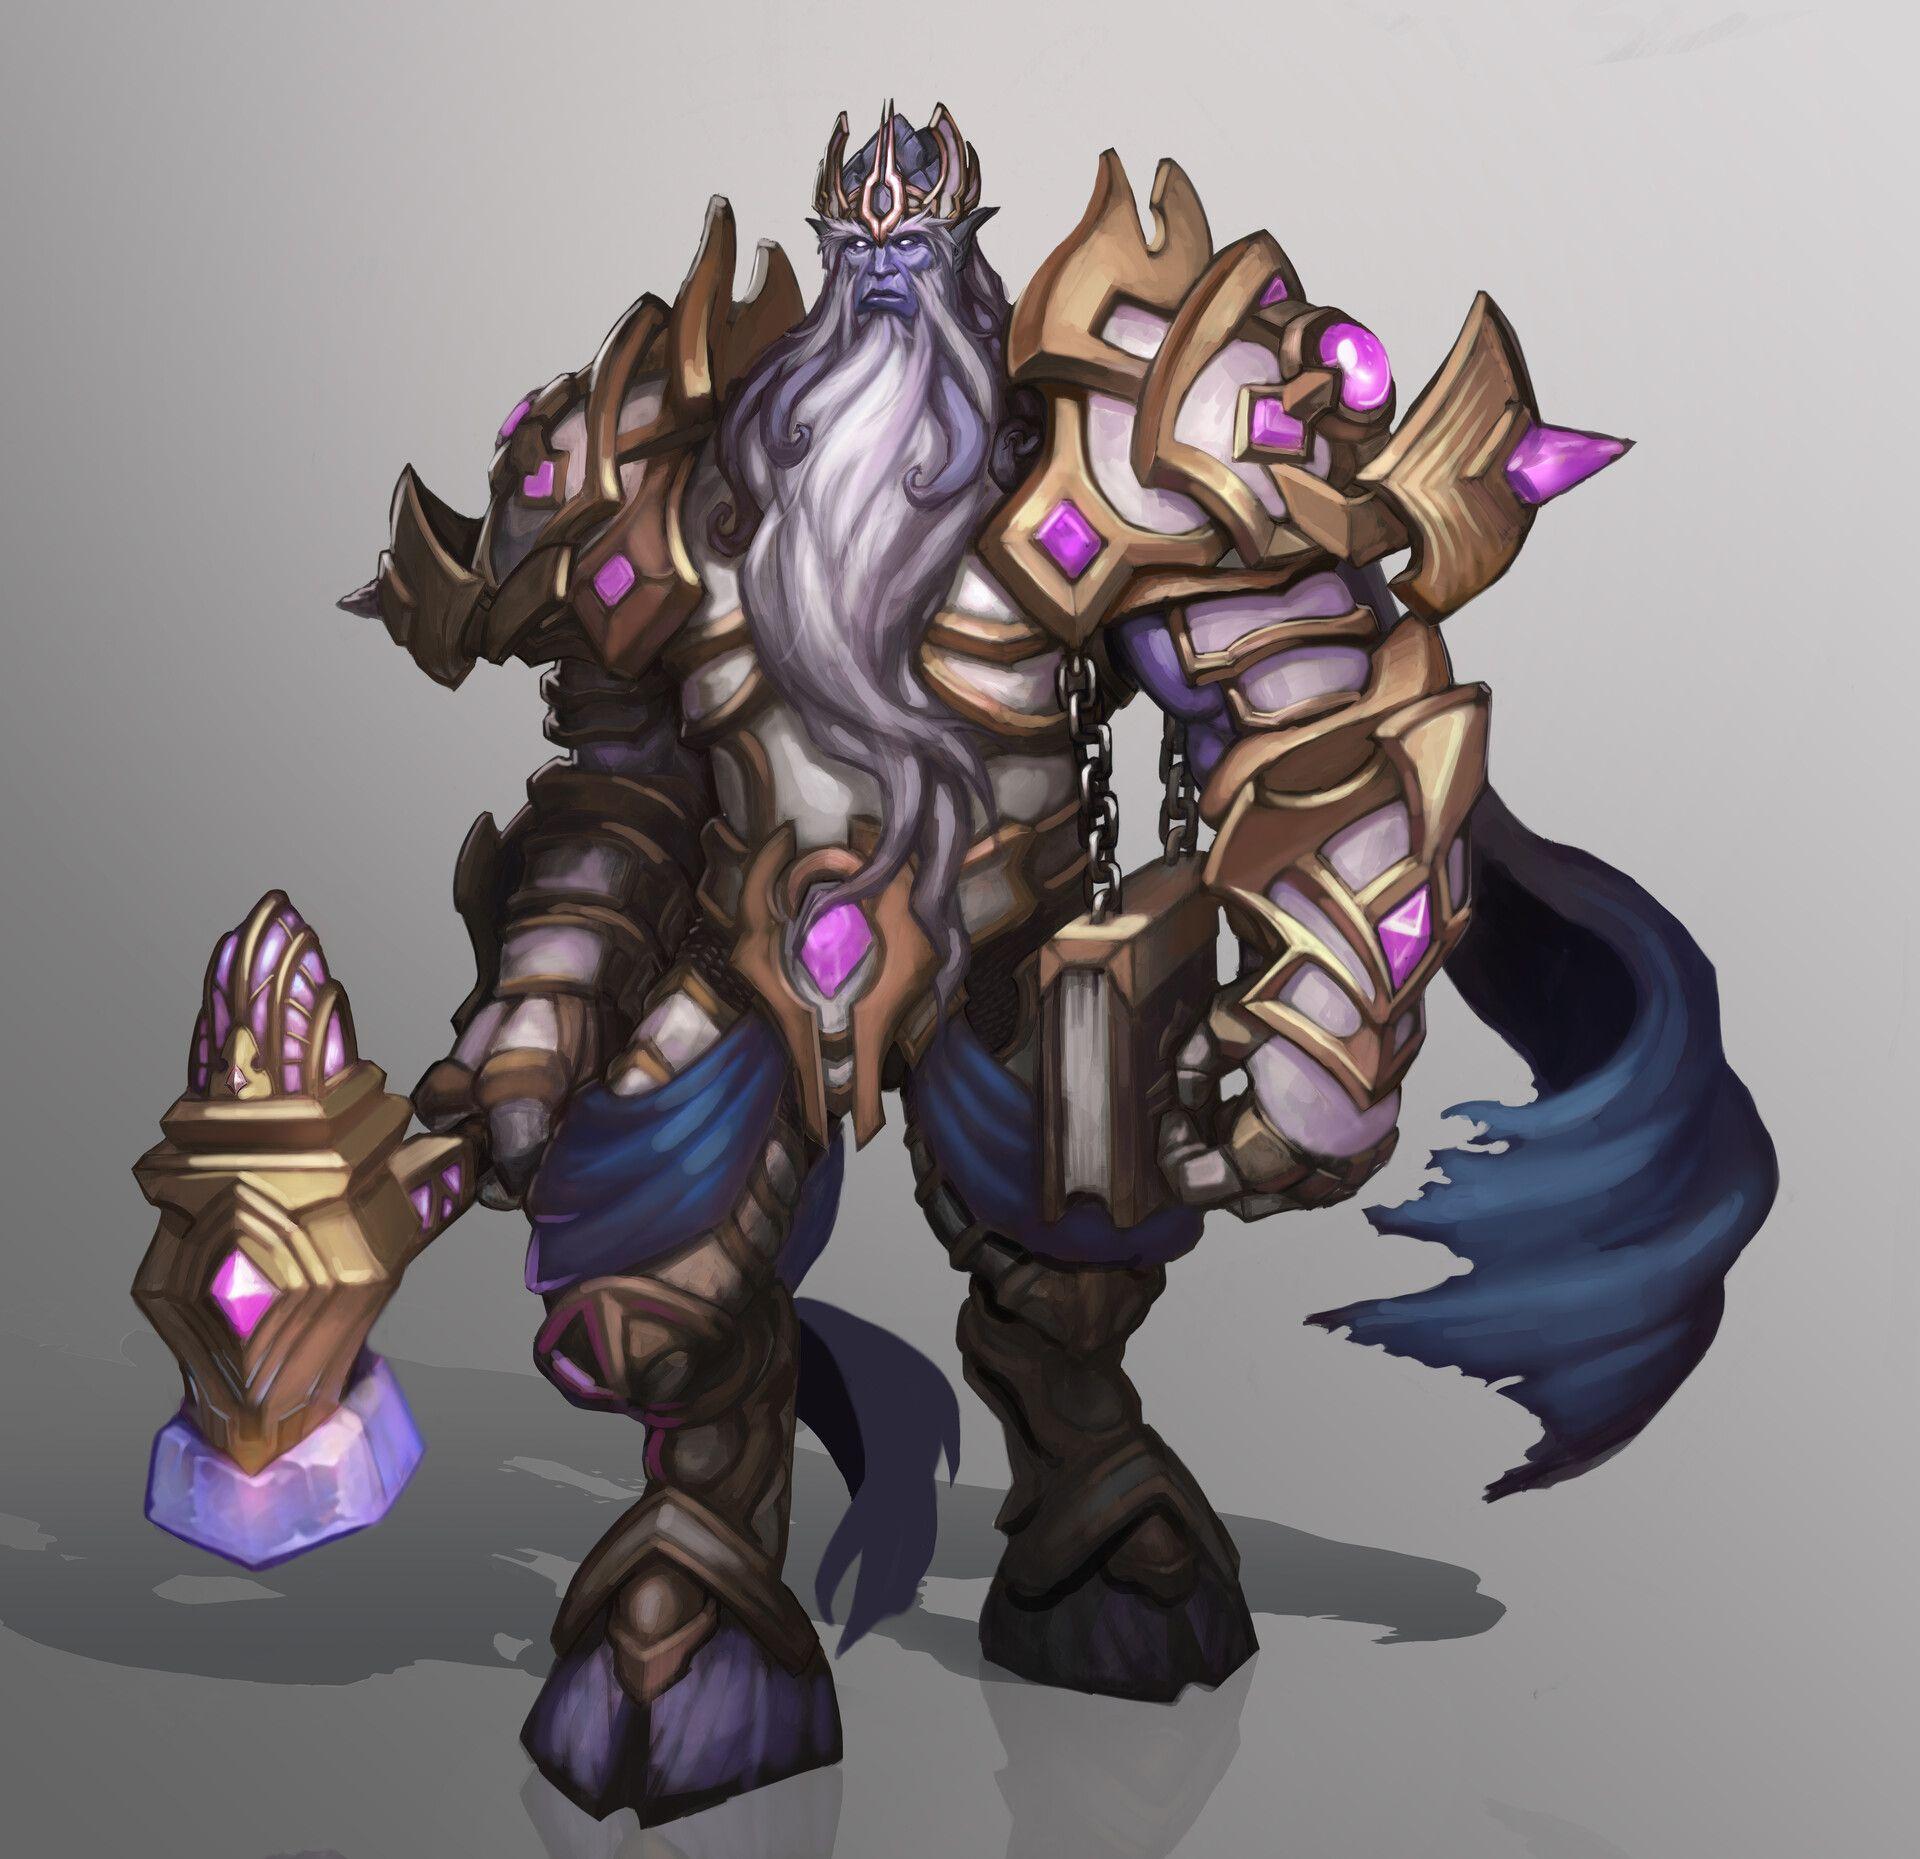 Vestiti Eleganti World Of Warcraft.Pin Di Alessandro Bonfanti Su World Of Warcraft Nel 2020